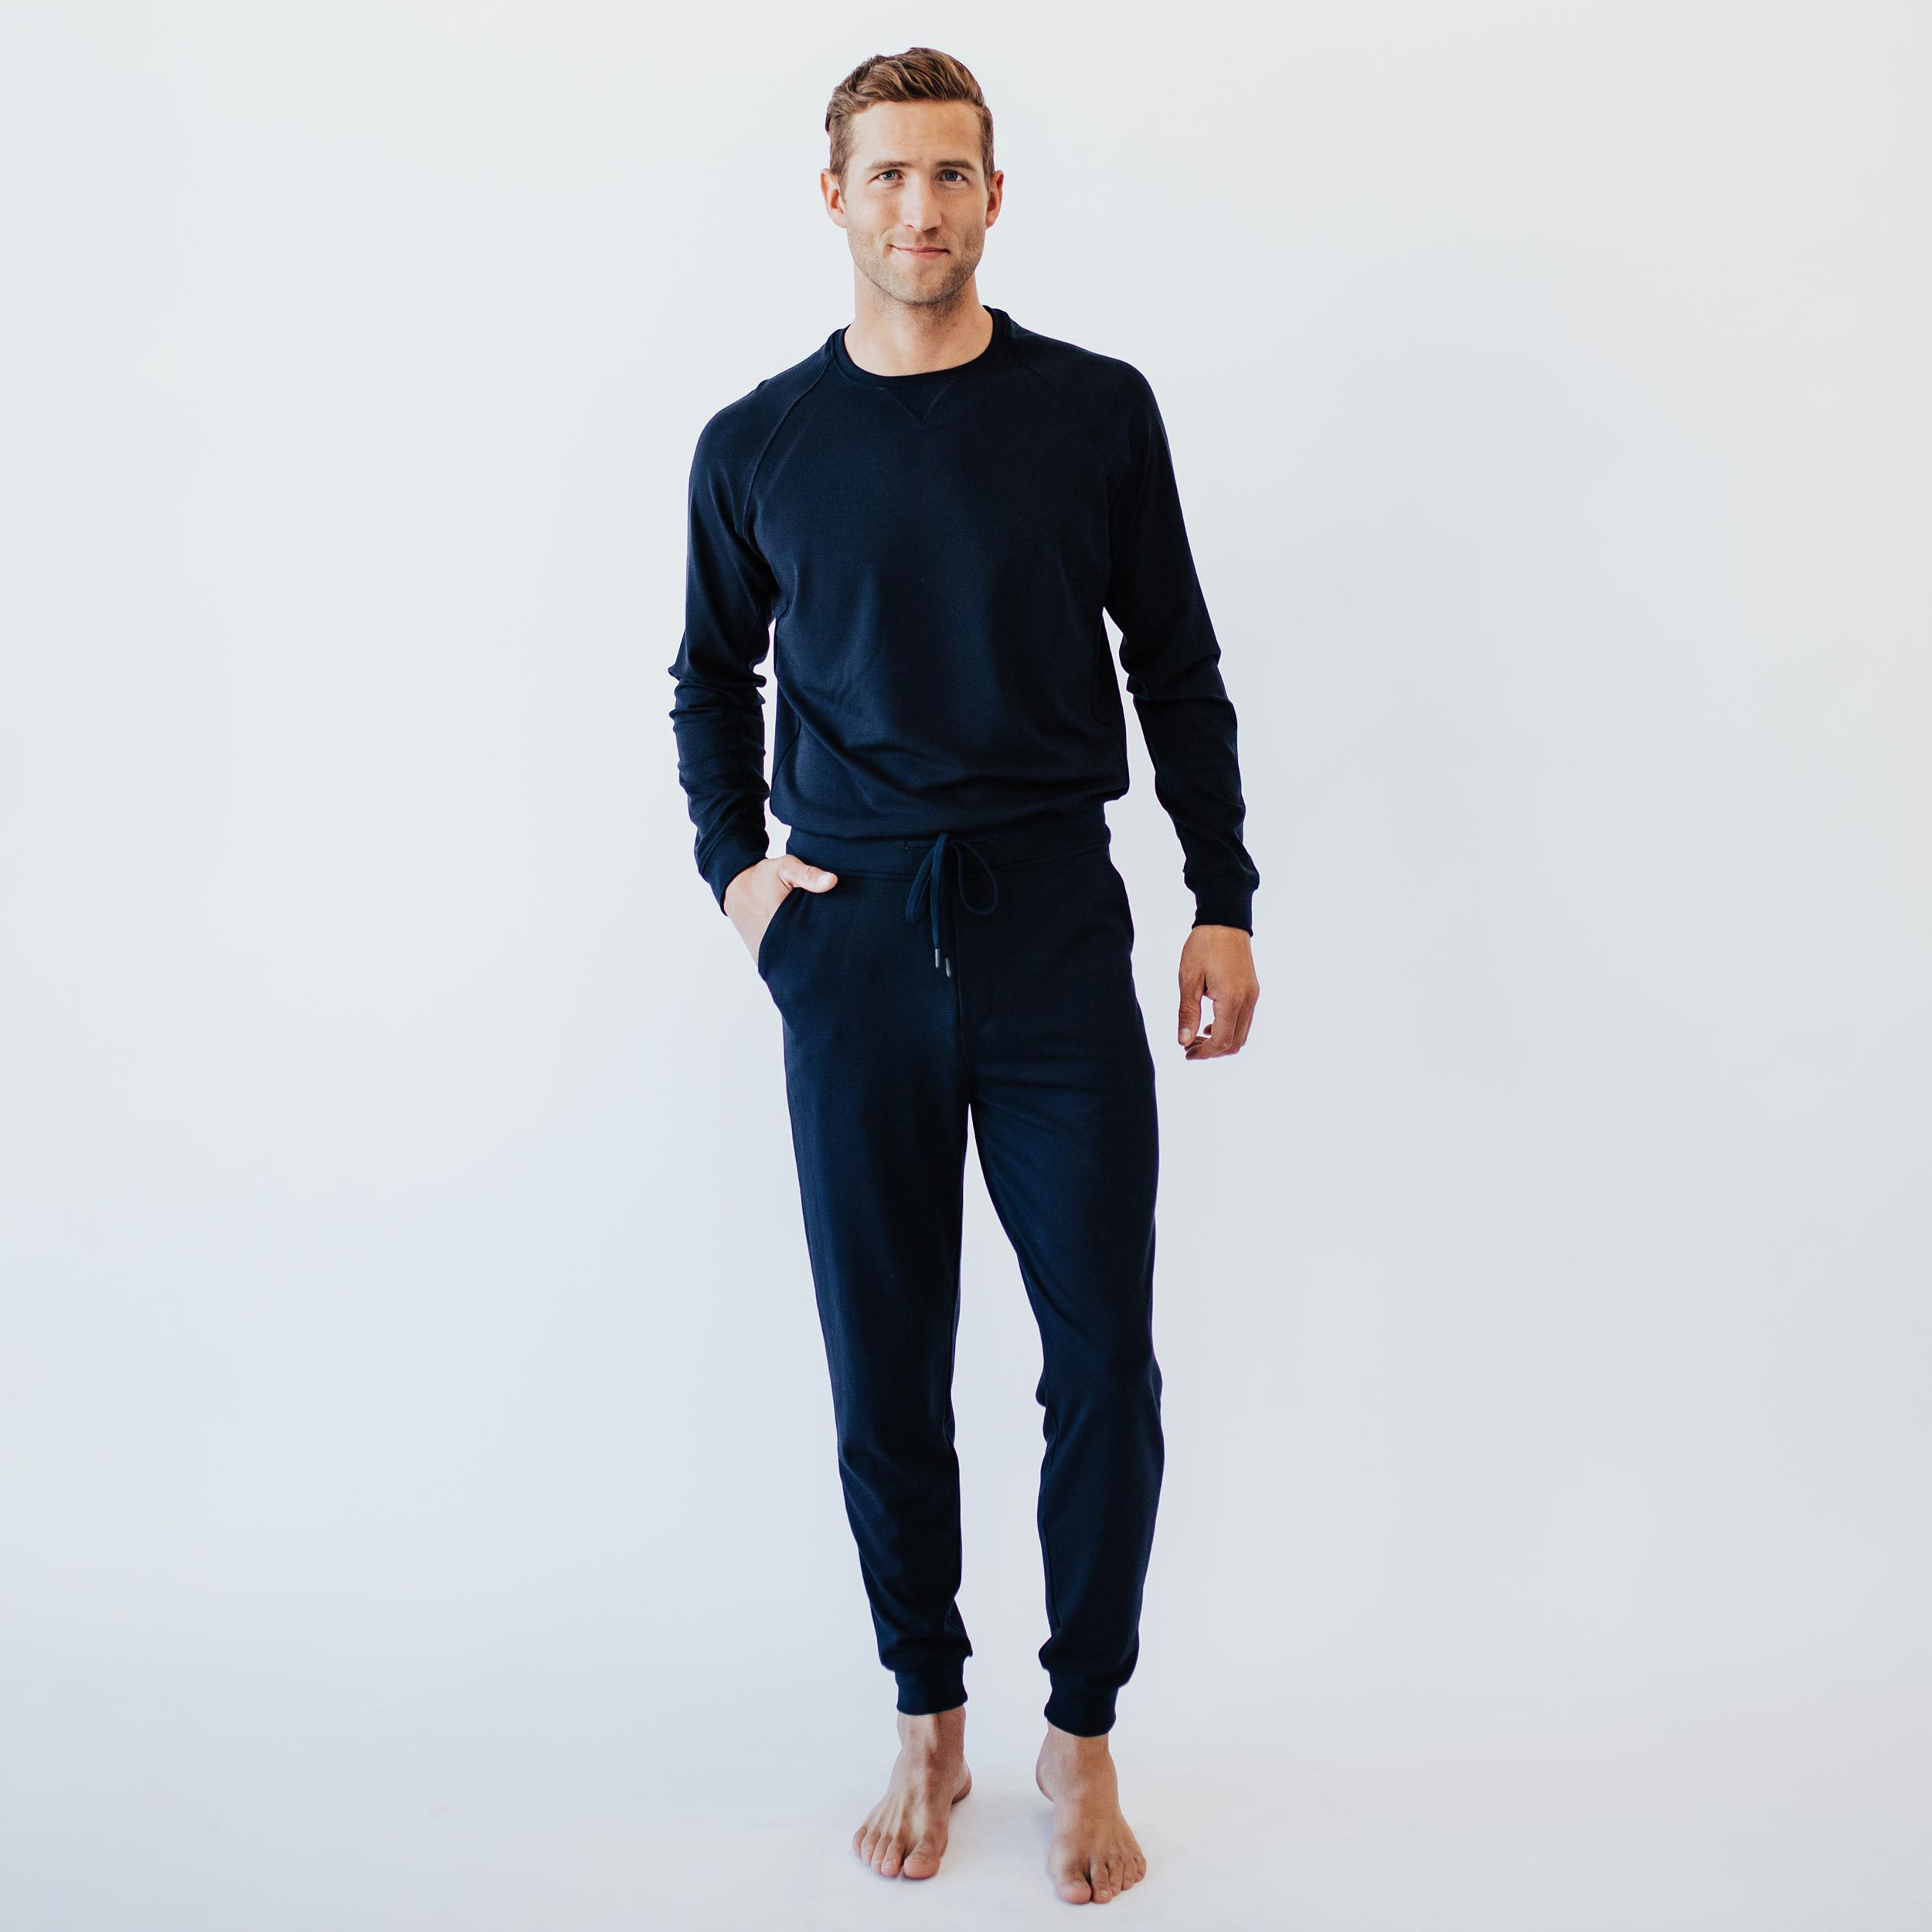 Cozy Earth Ultra-Soft Bamboo Jogger Pant